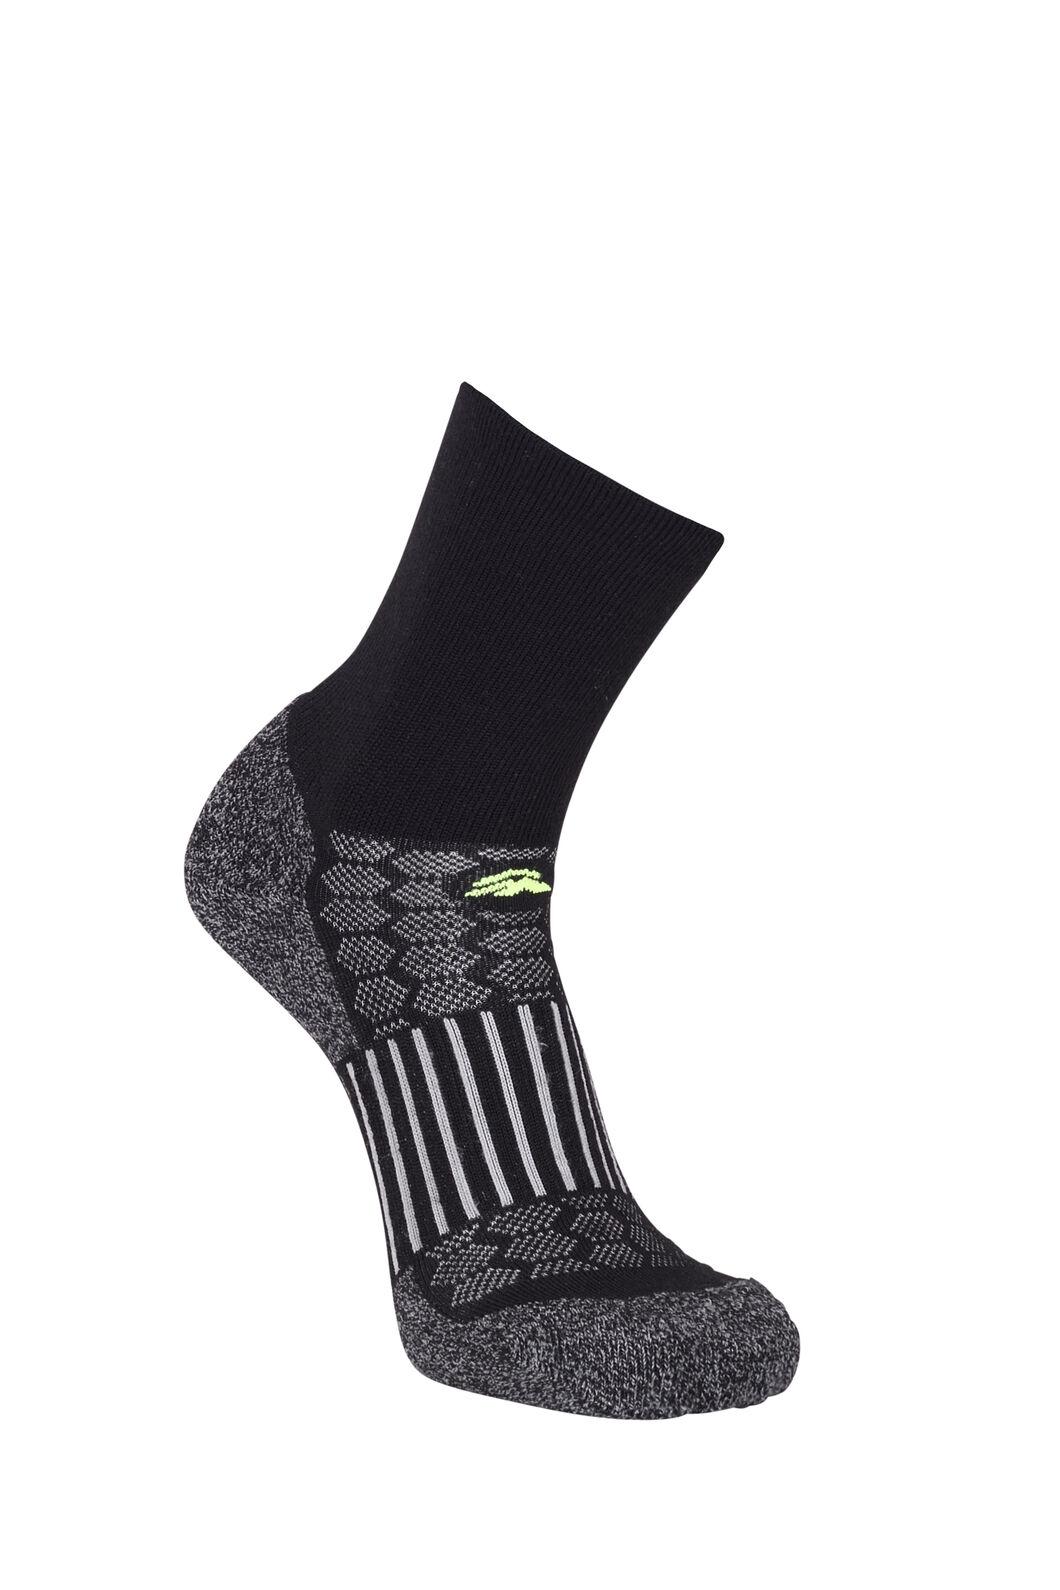 Macpac Tech Merino Hiker Socks, Black, hi-res